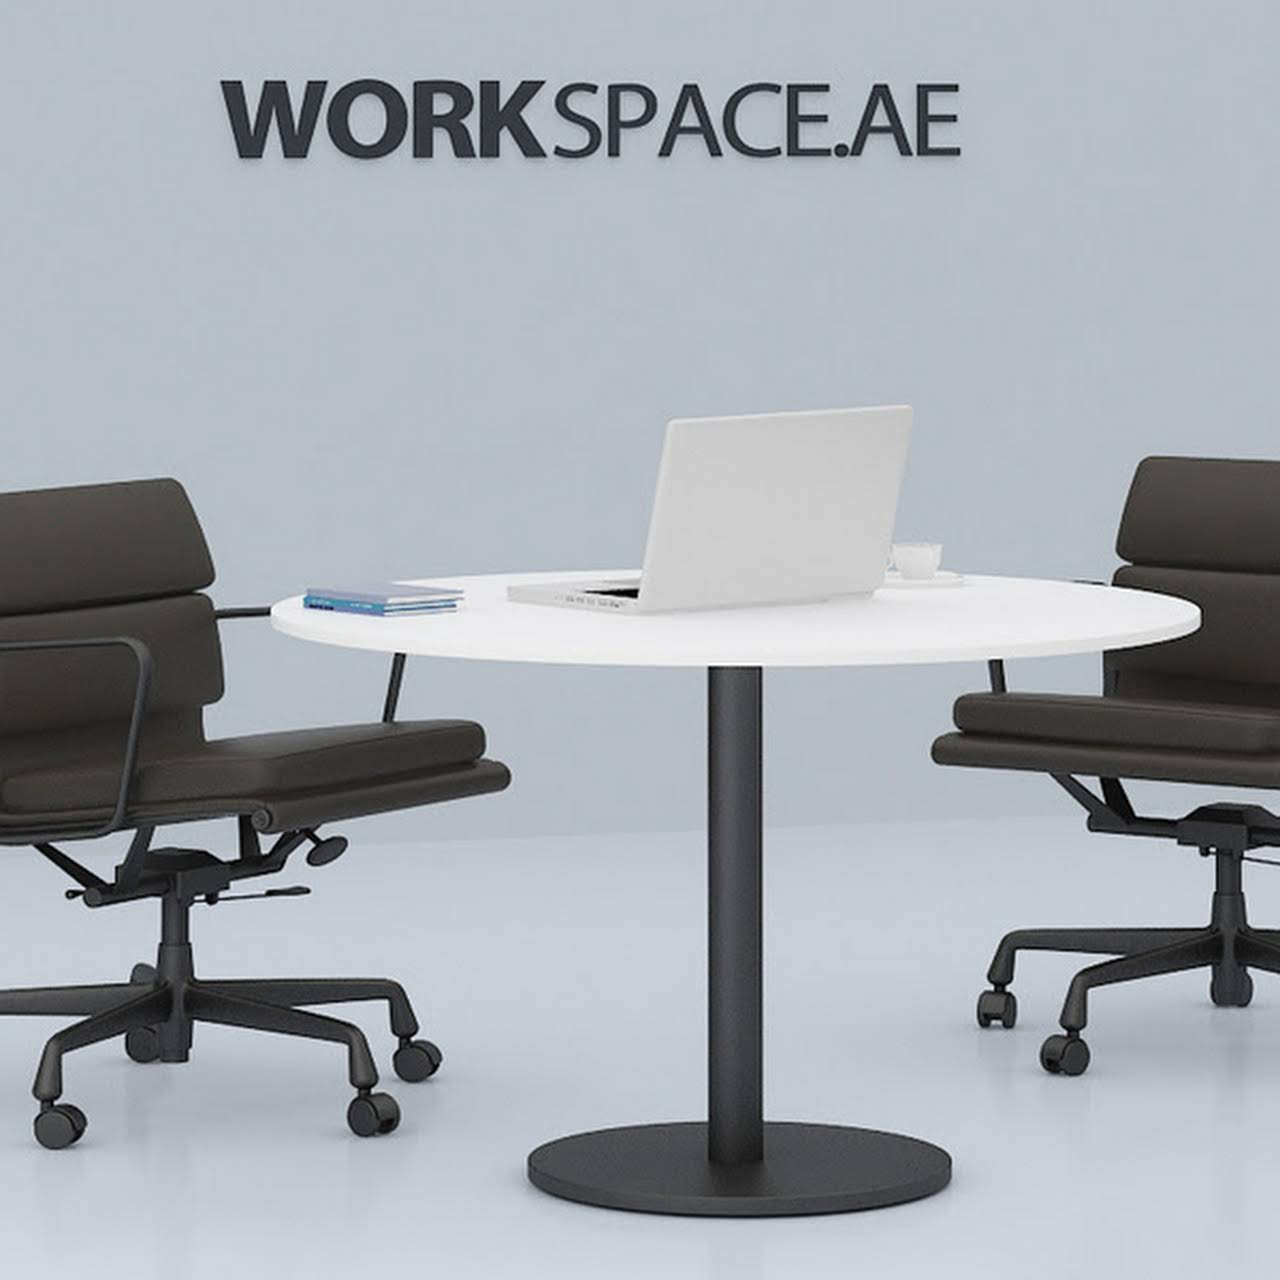 Workspace ae Office Furniture Dubai - Office Furniture Store